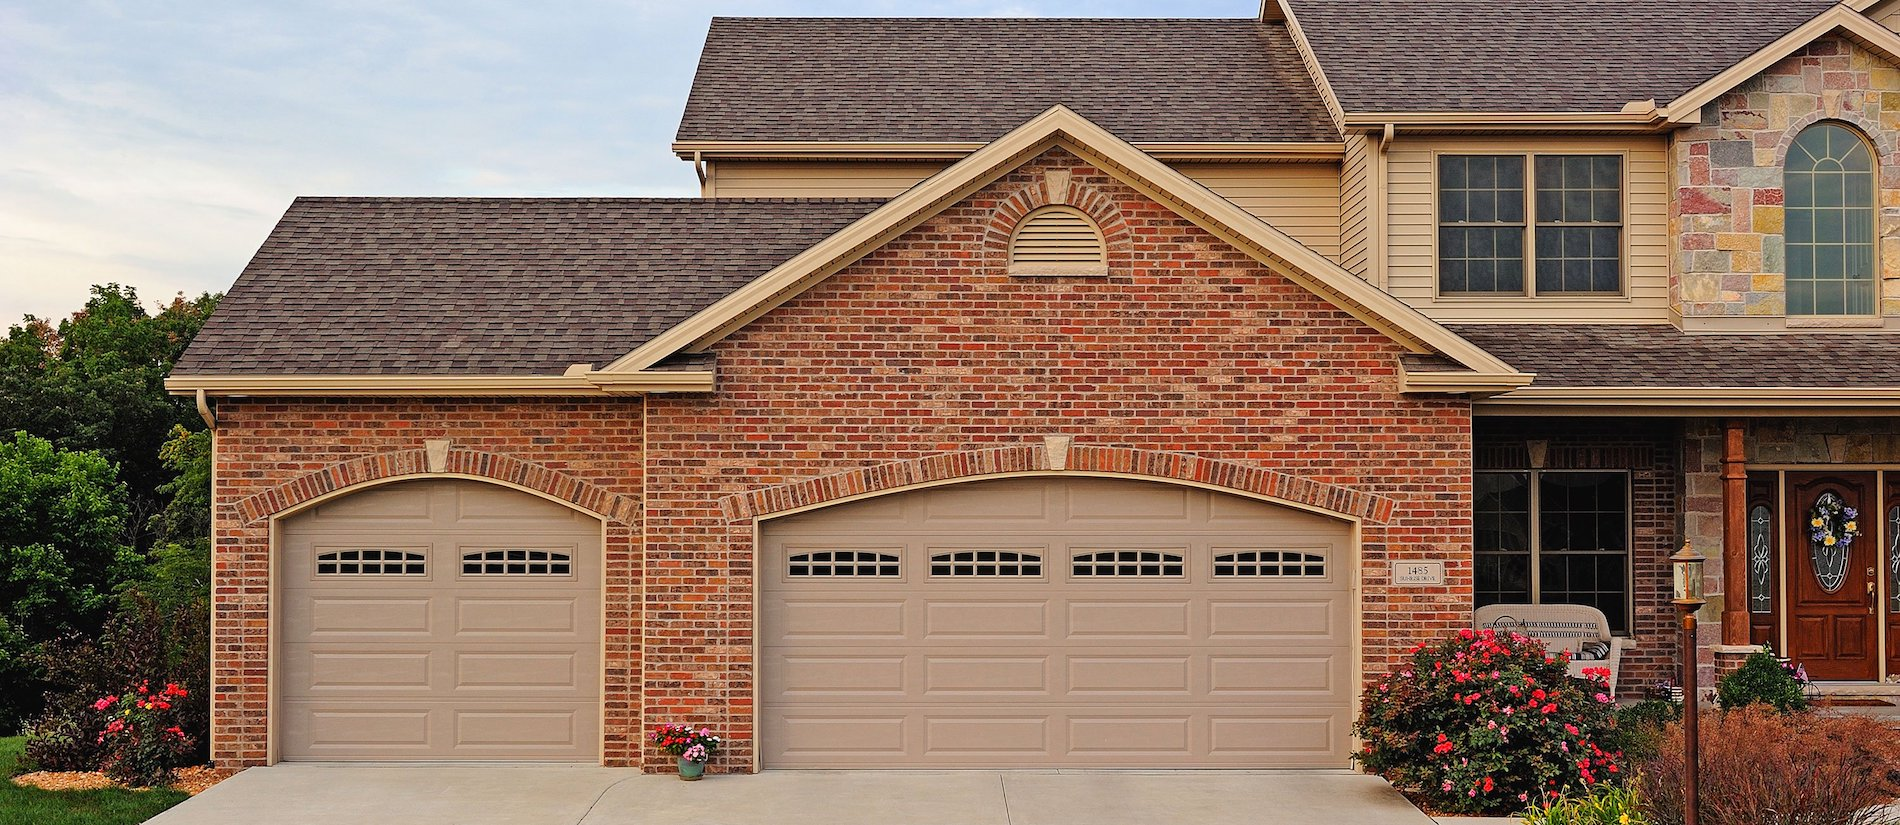 Merveilleux Local Garage Door Repair And Installation * $0 Service Call ...